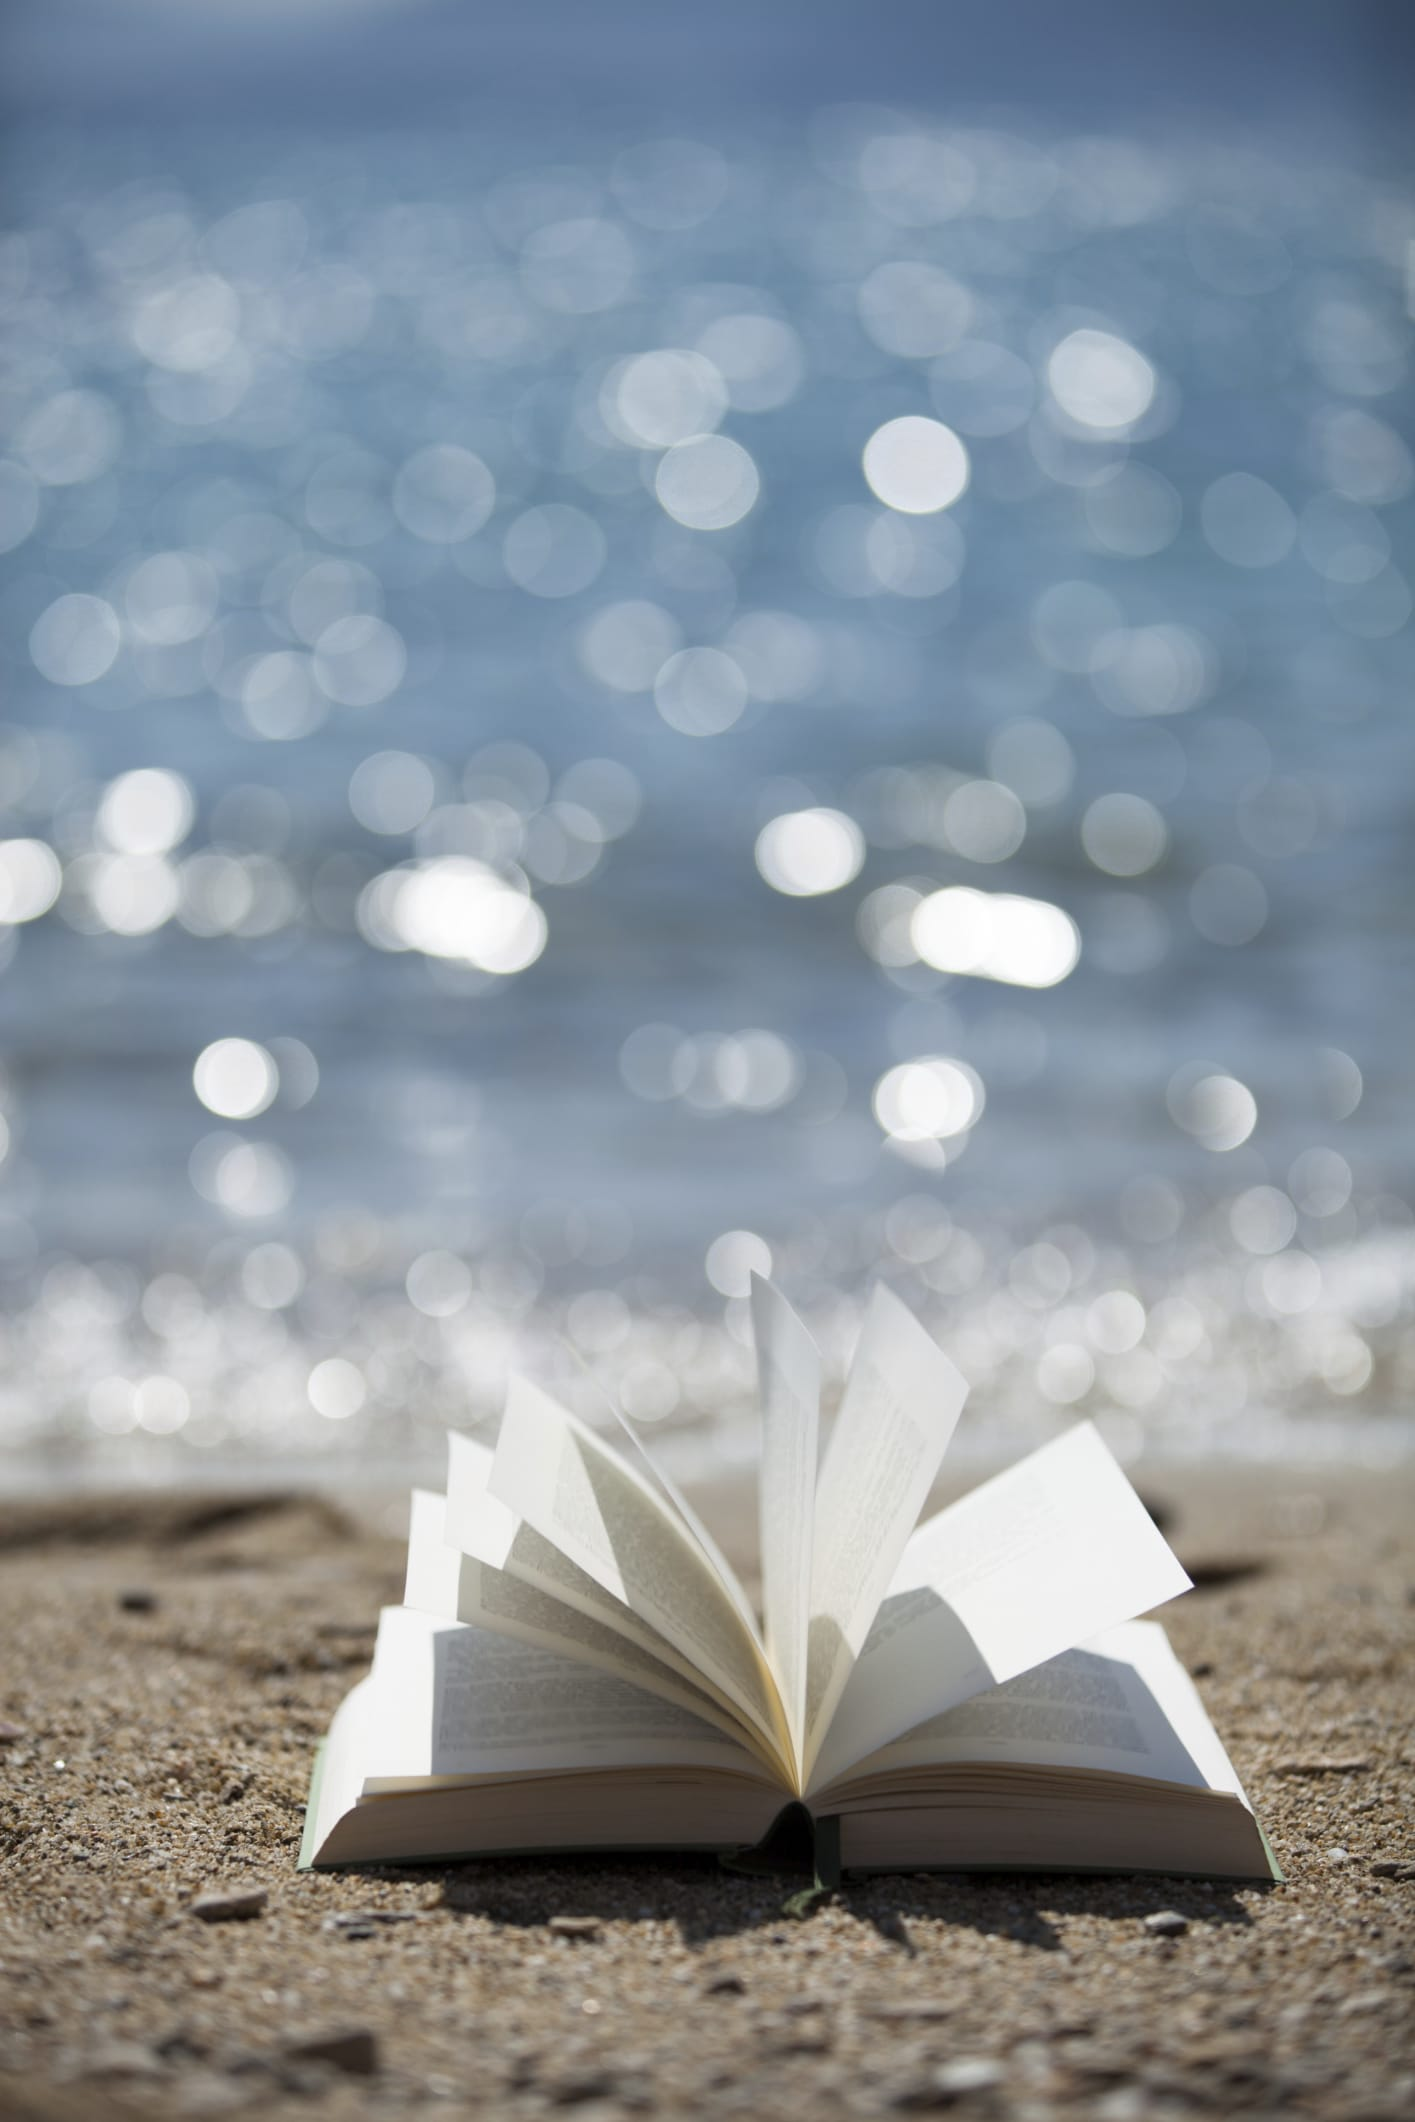 Libri da leggere in vacanza i consigli di lettura di slow for Libri di cucina da regalare